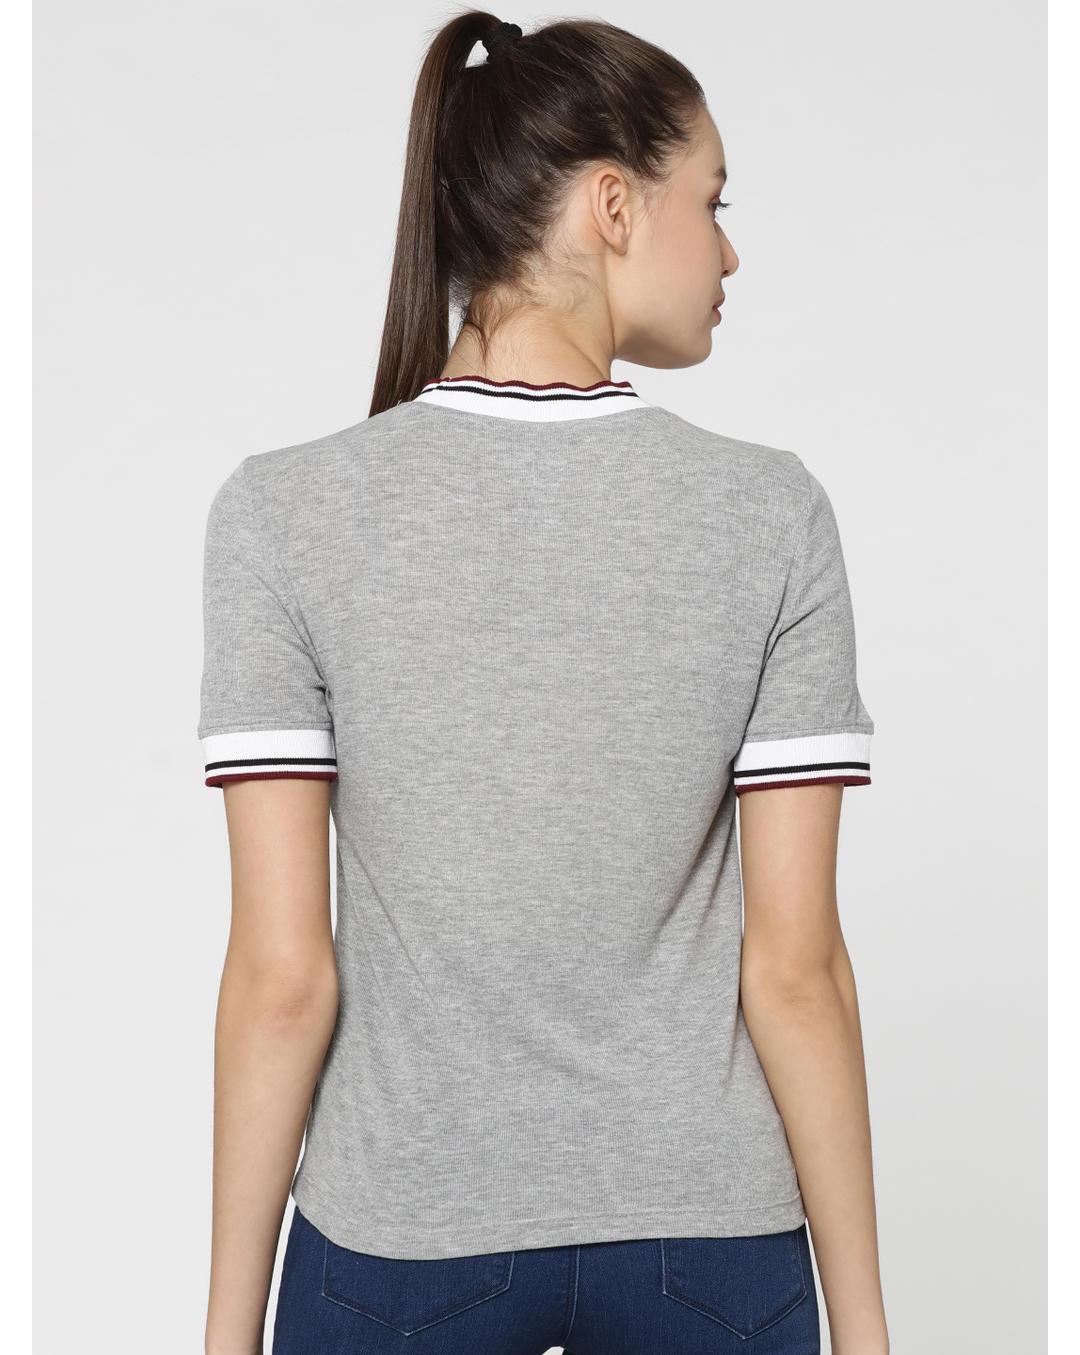 fdd7e5bb8112 Buy ONLY X Harry Potter Light Grey High Neck Varsity T-Shirt Online ...